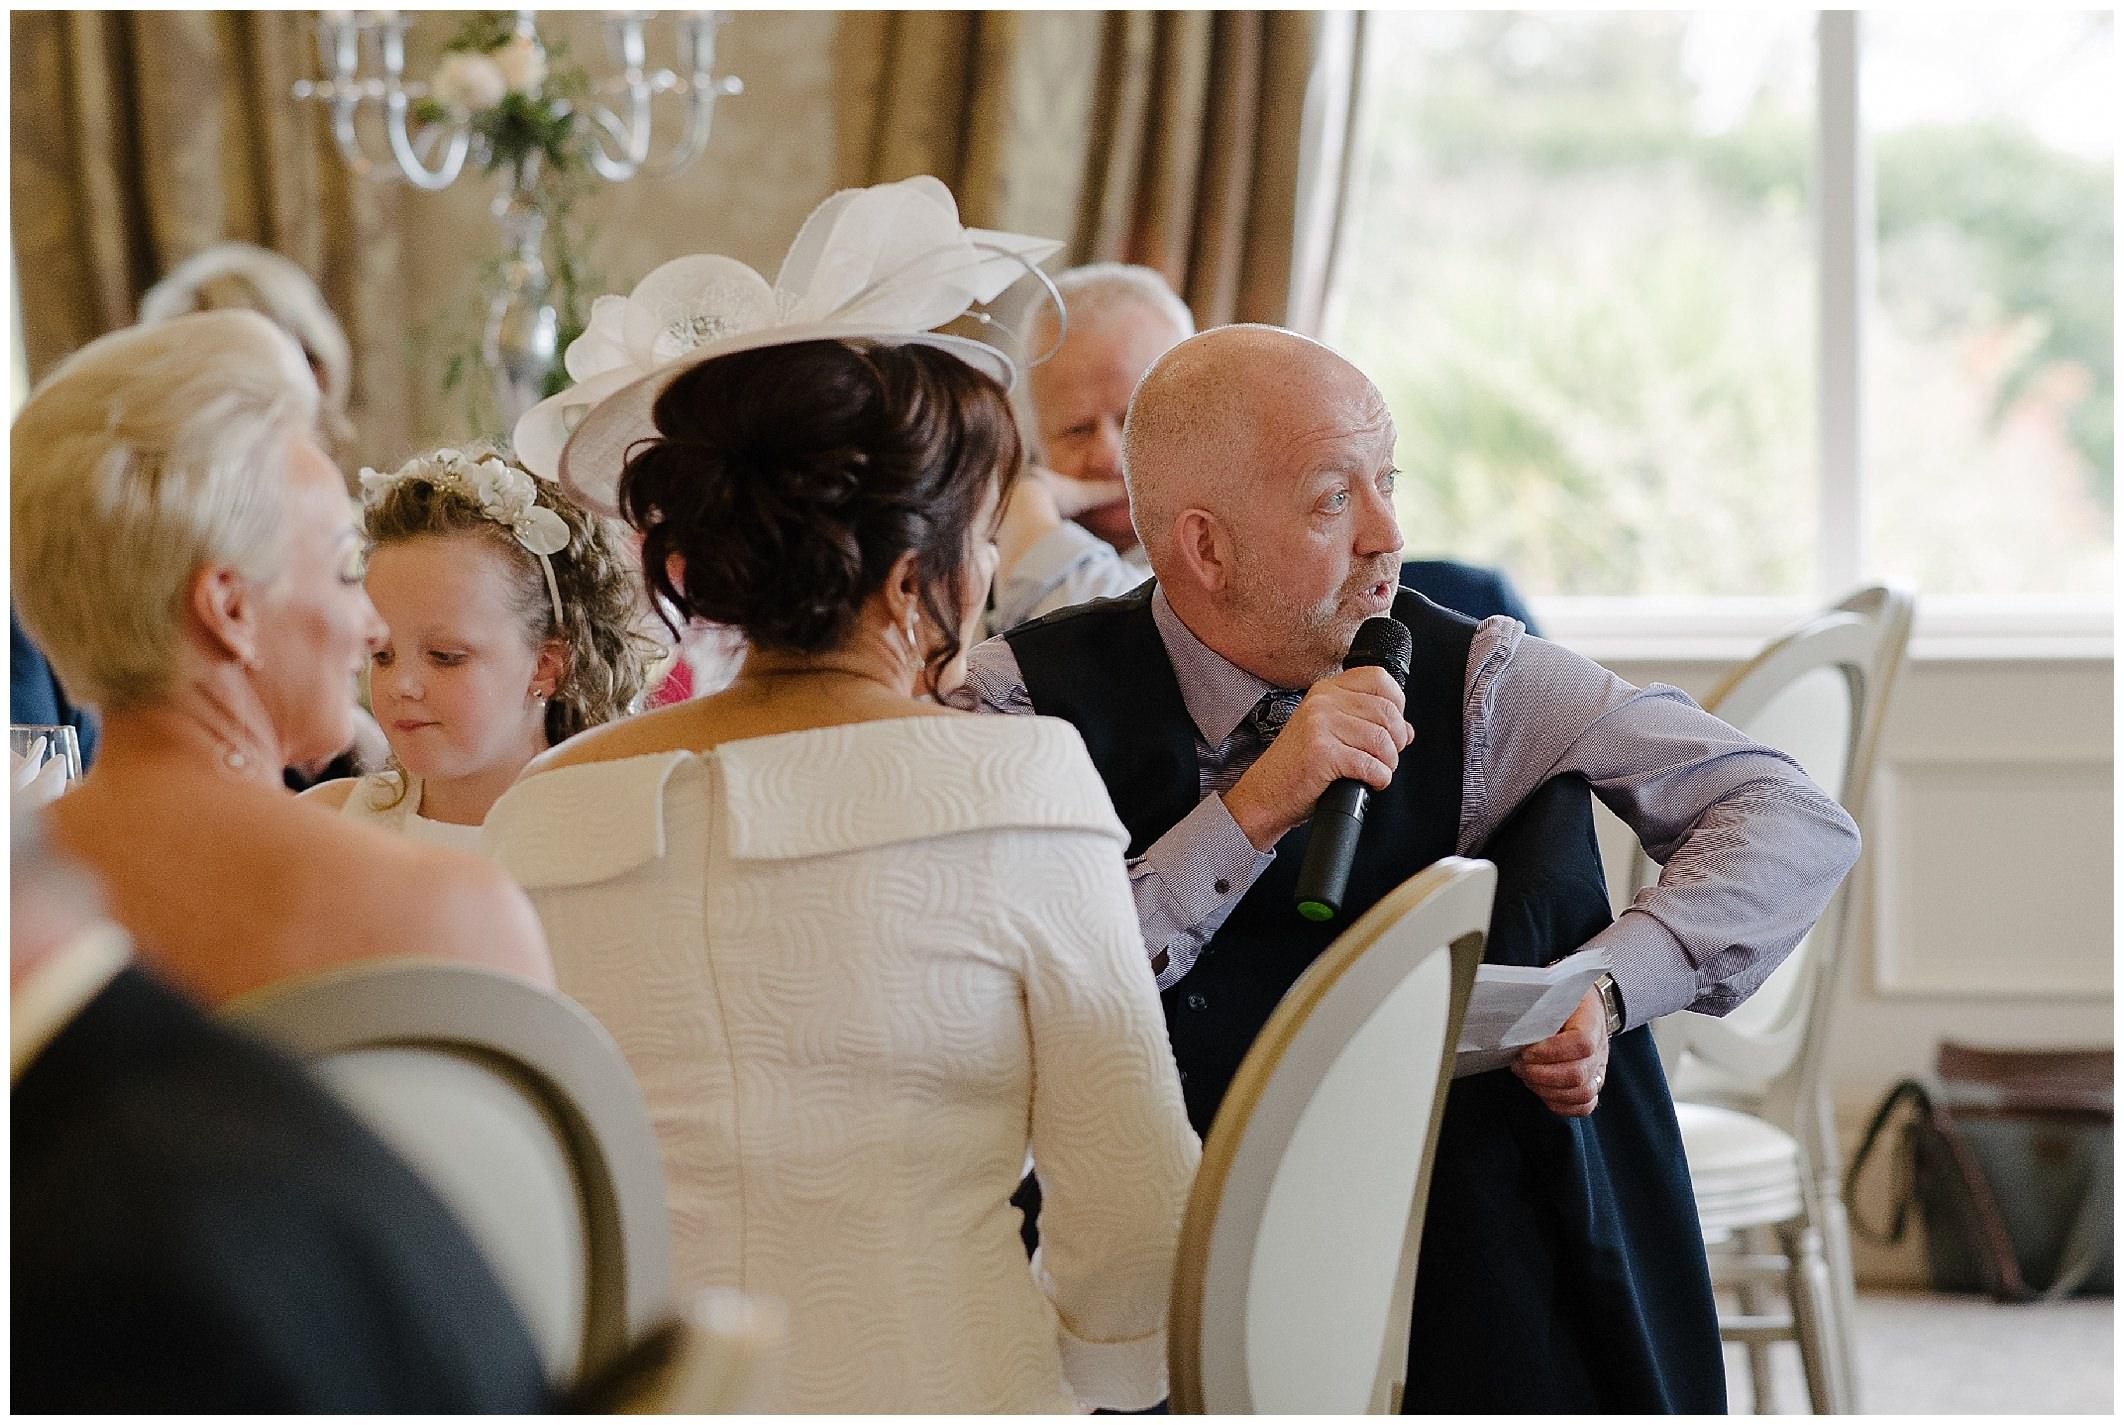 corick-house-wedding-hannah-gary-jude-browne-photography_0084.jpg